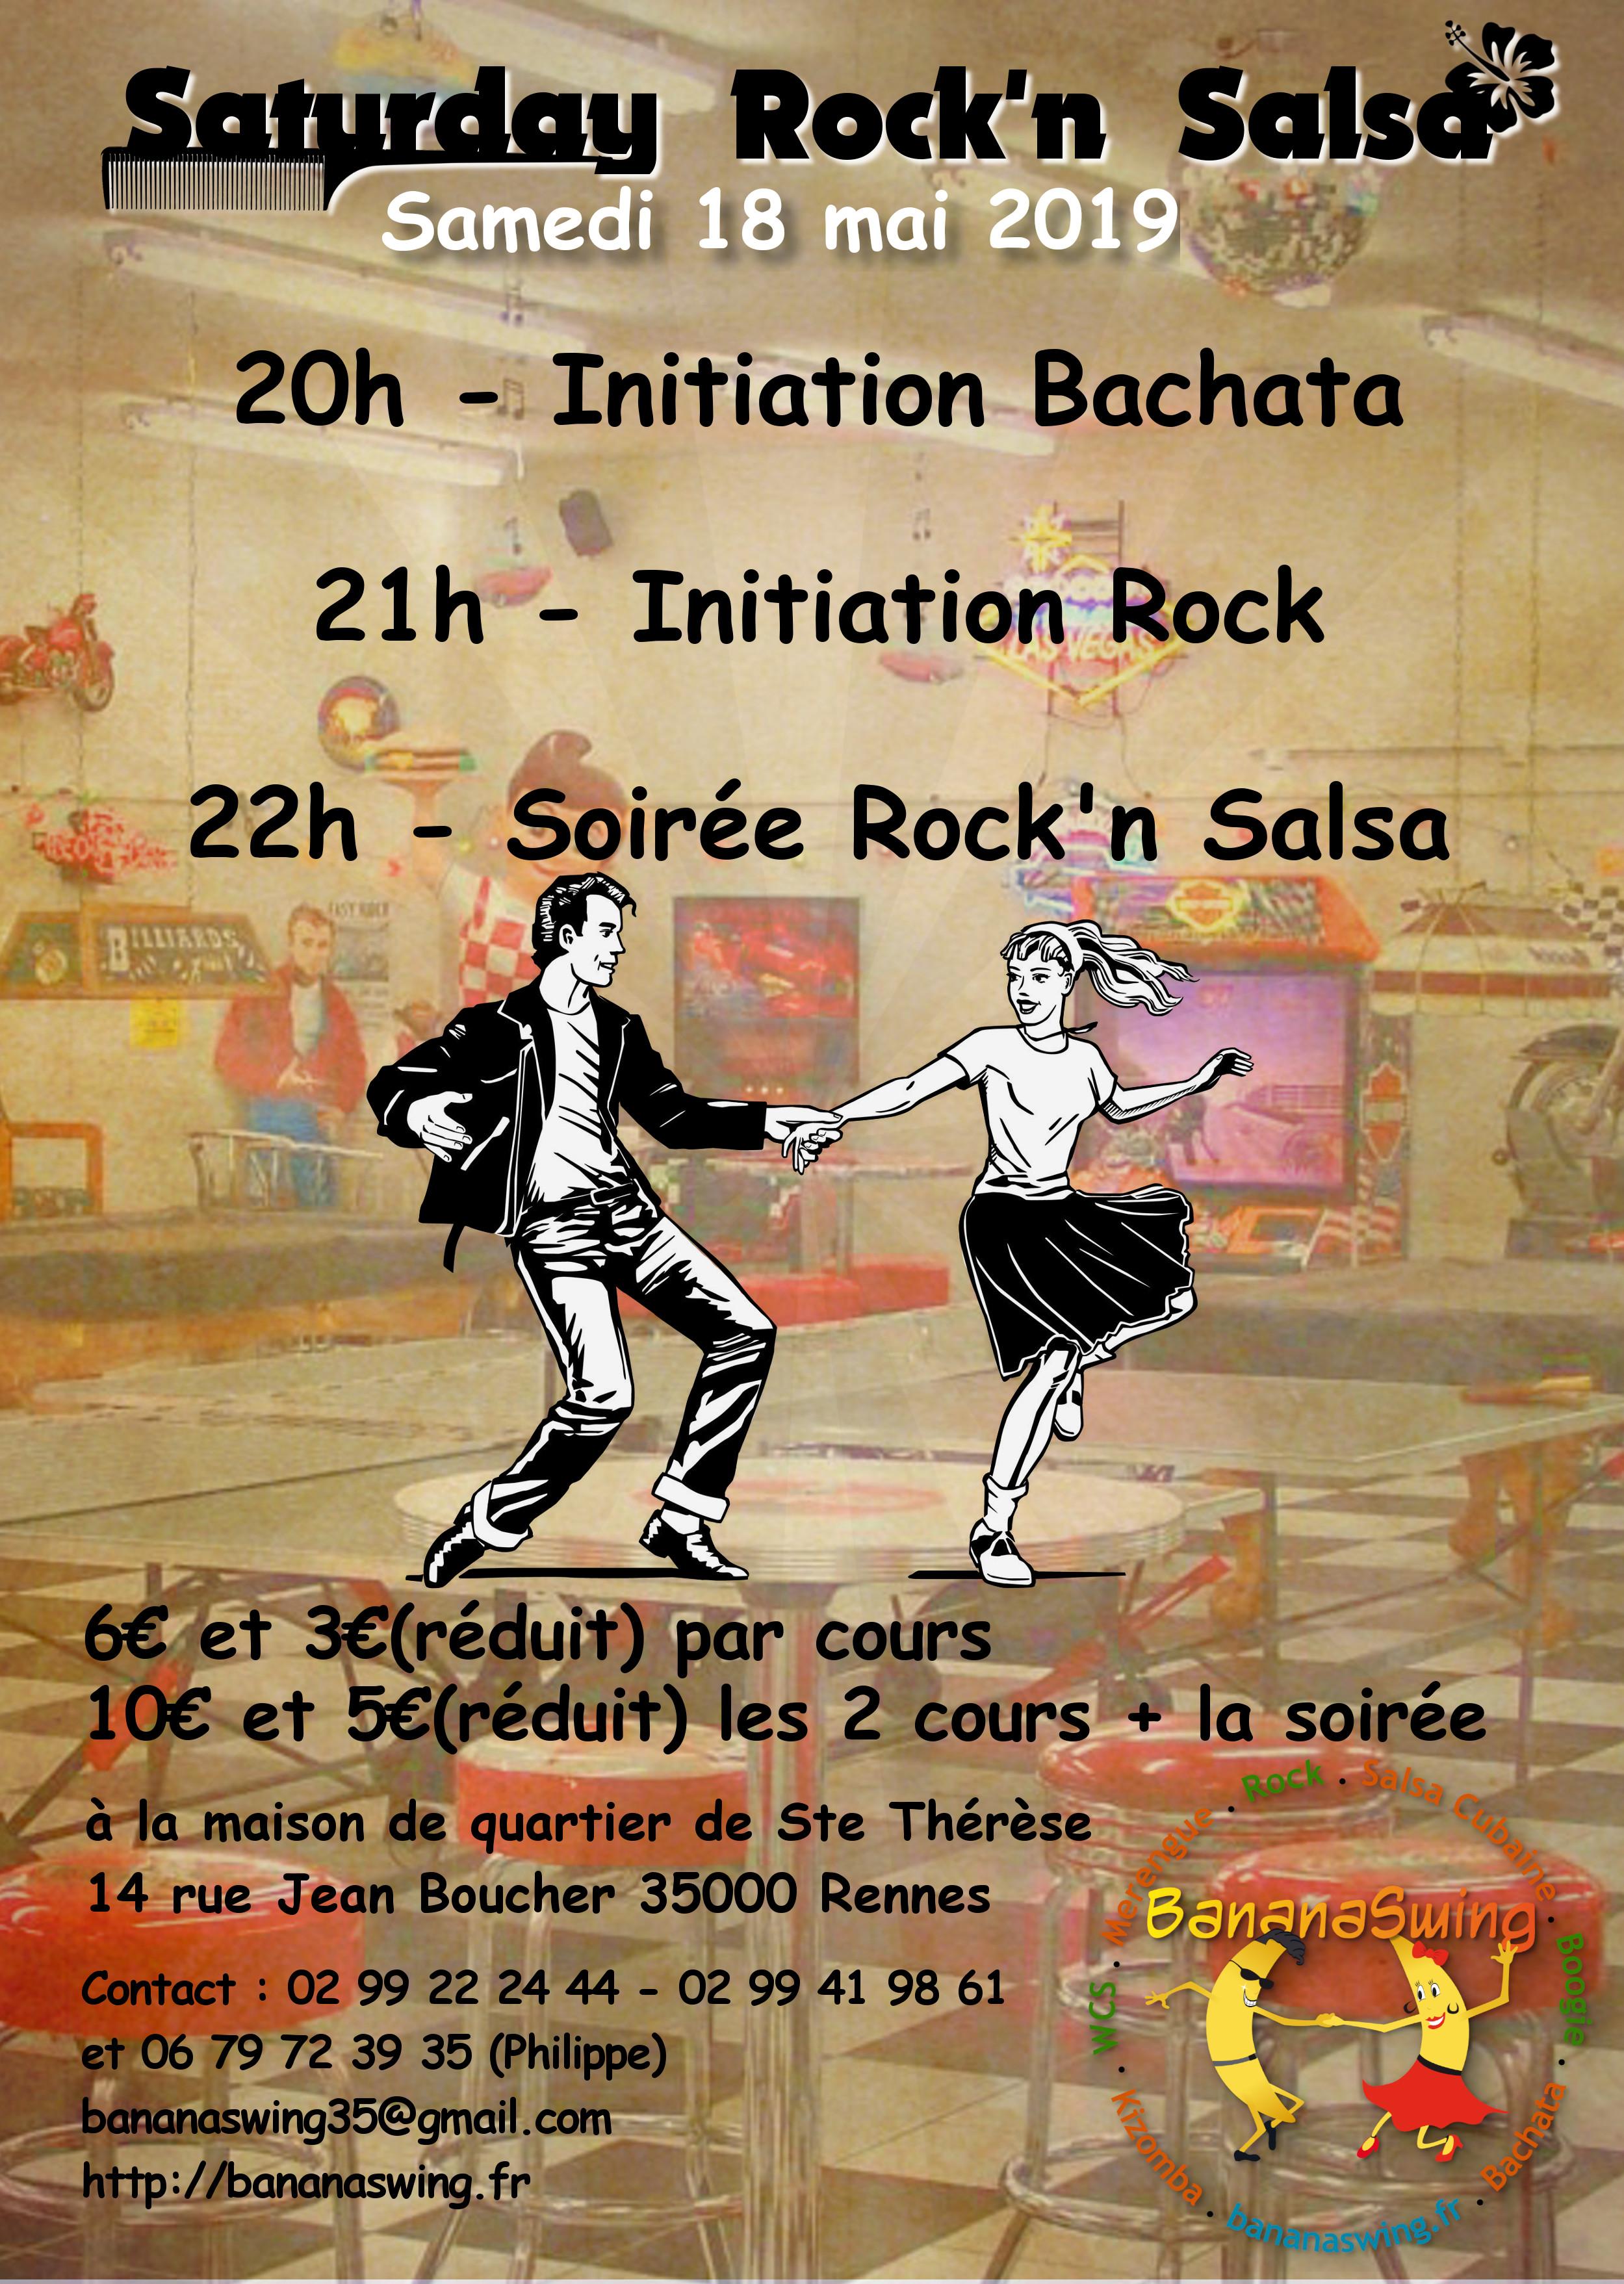 Samedi 18 mai – Soirée Rock'n Salsa